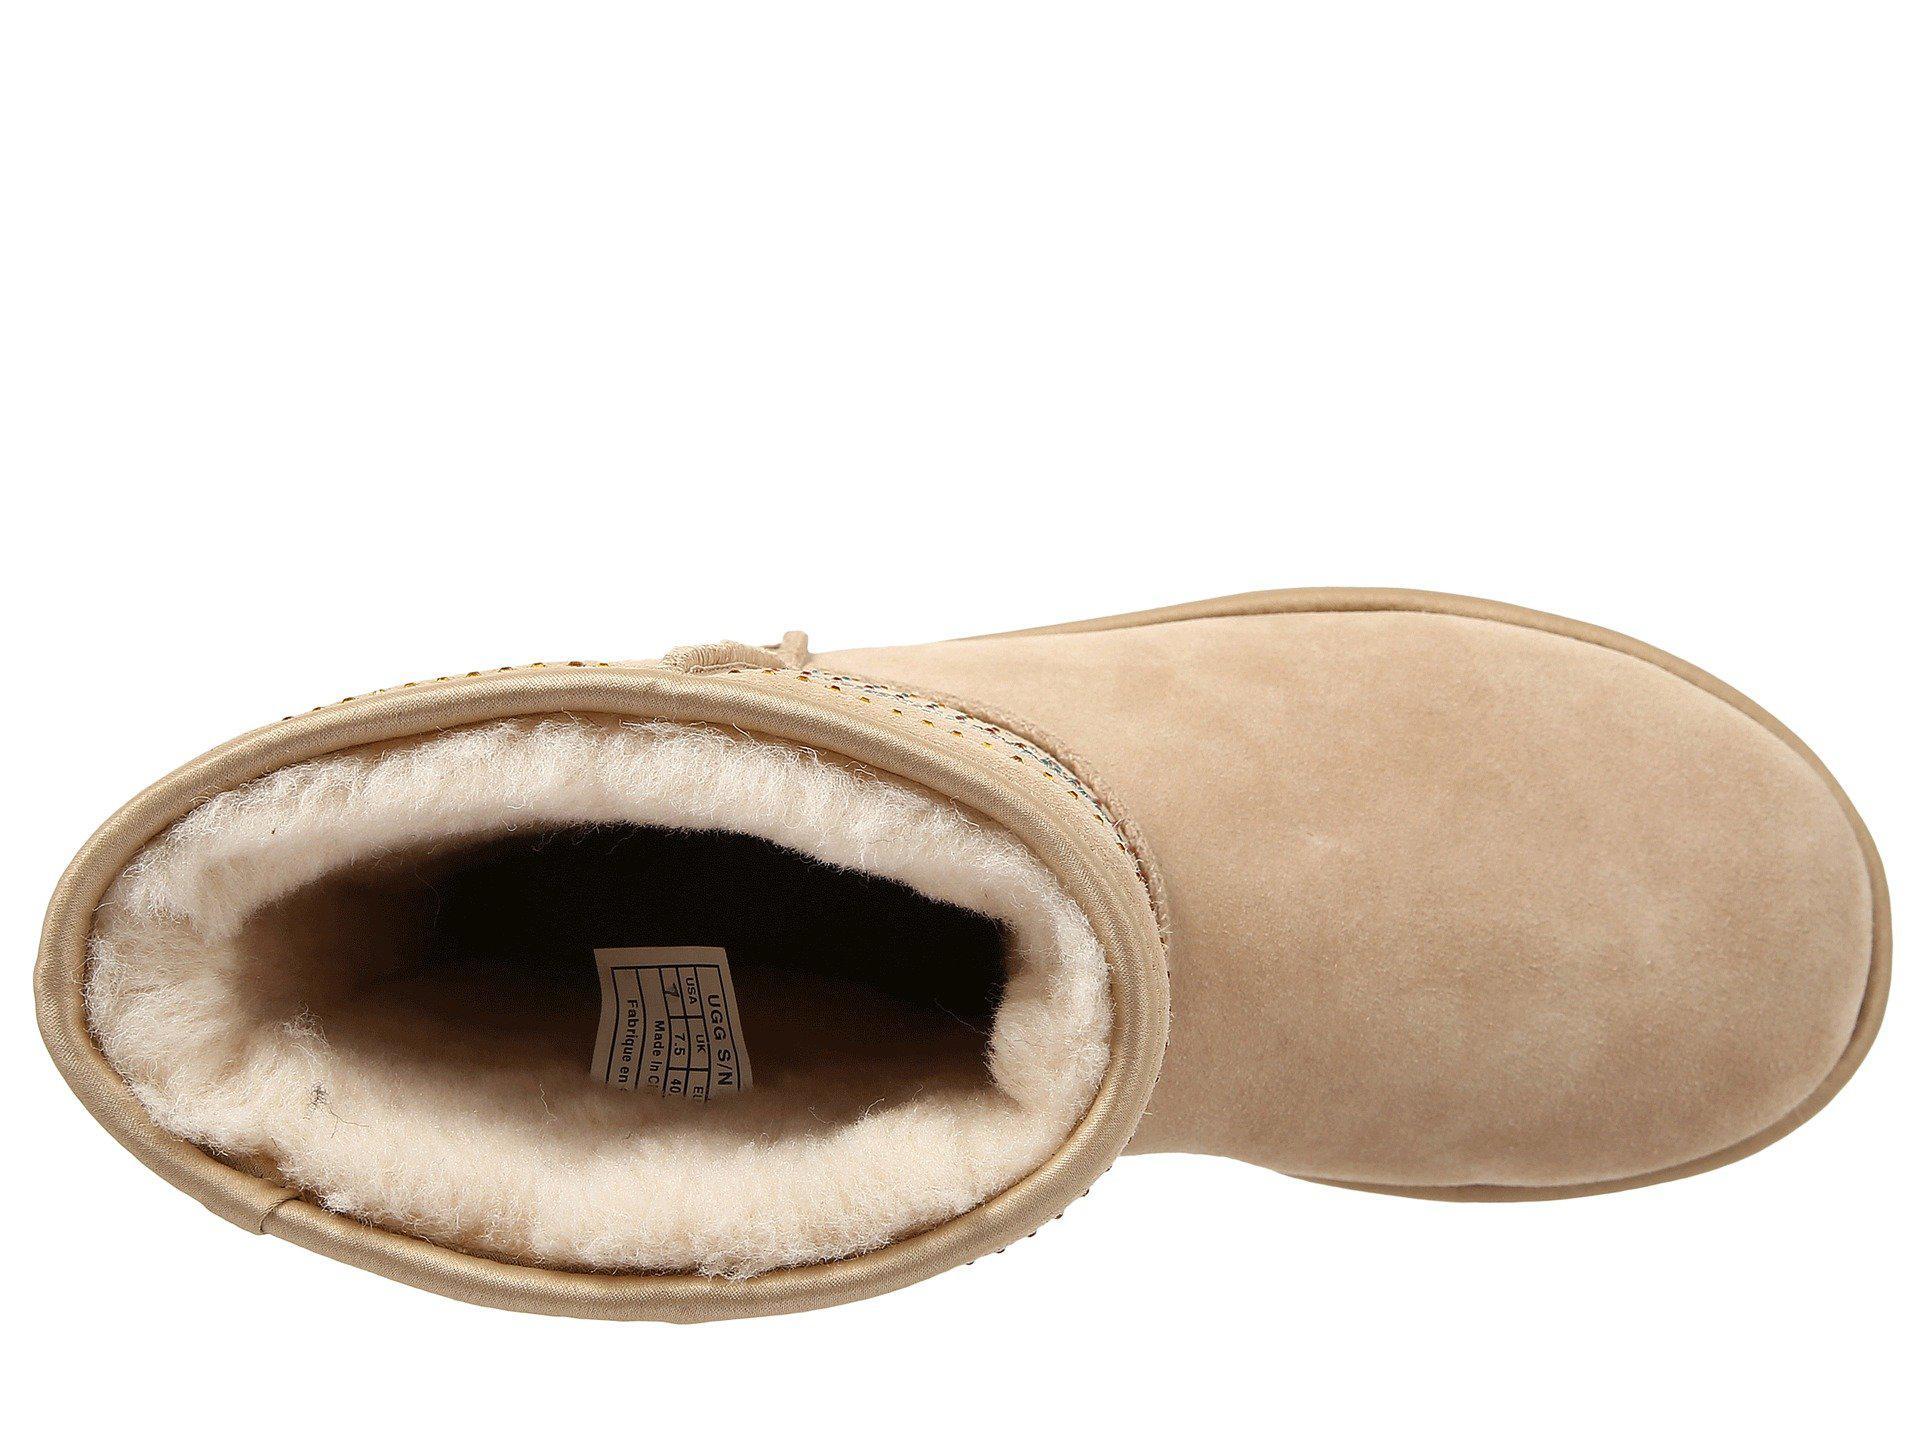 Ugg - Natural Classic Short Serape Bling (sand Twinface) Women's Pull-on Boots. View fullscreen